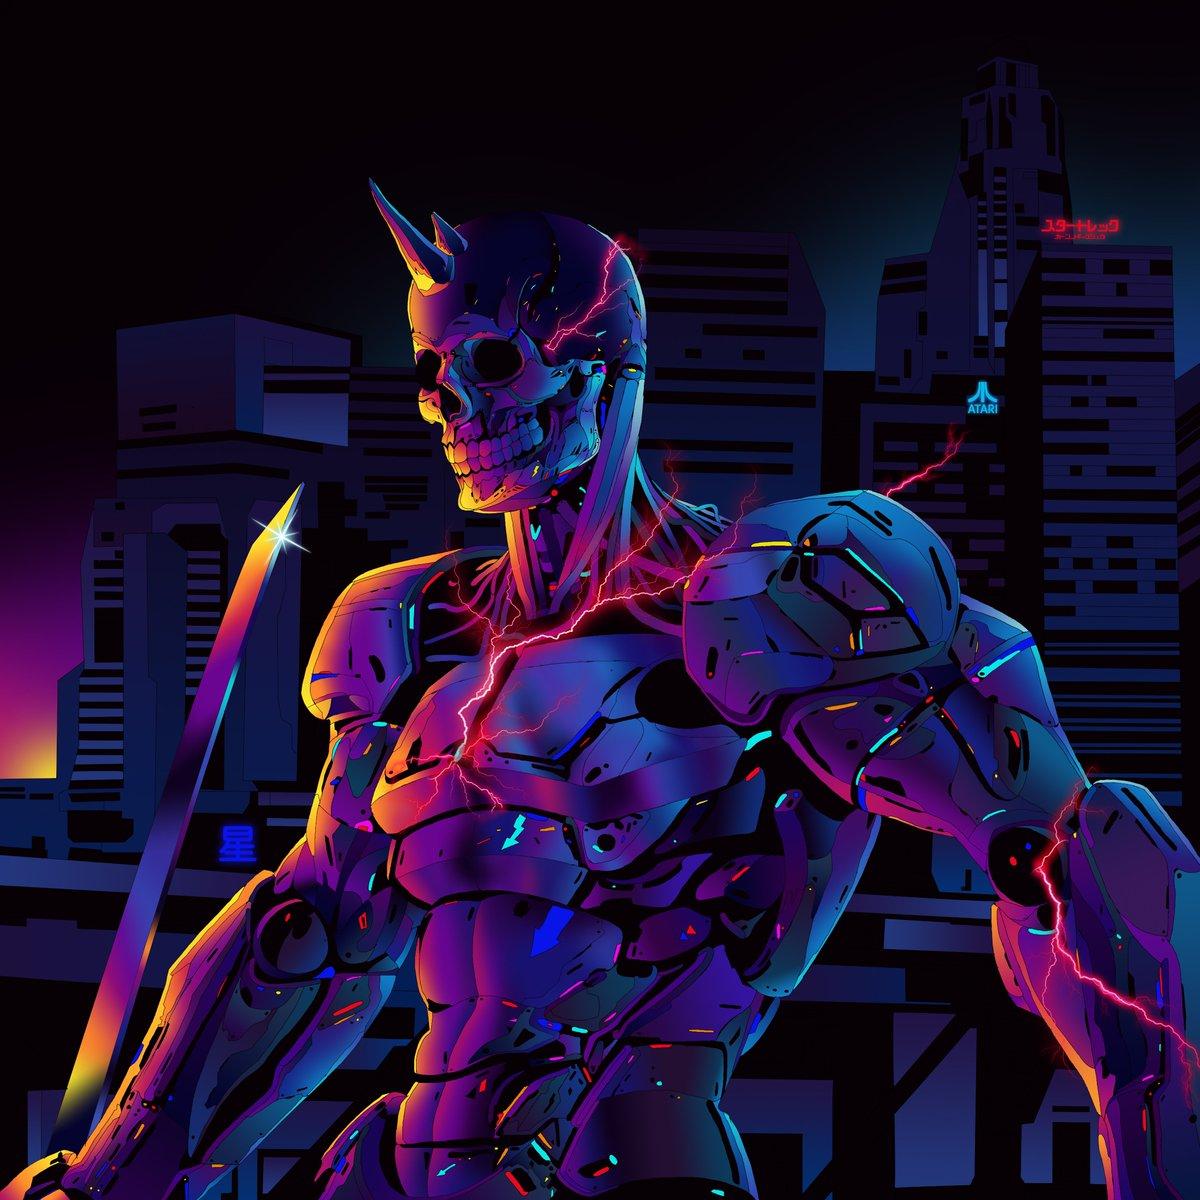 Cyborg Concept Art Anime